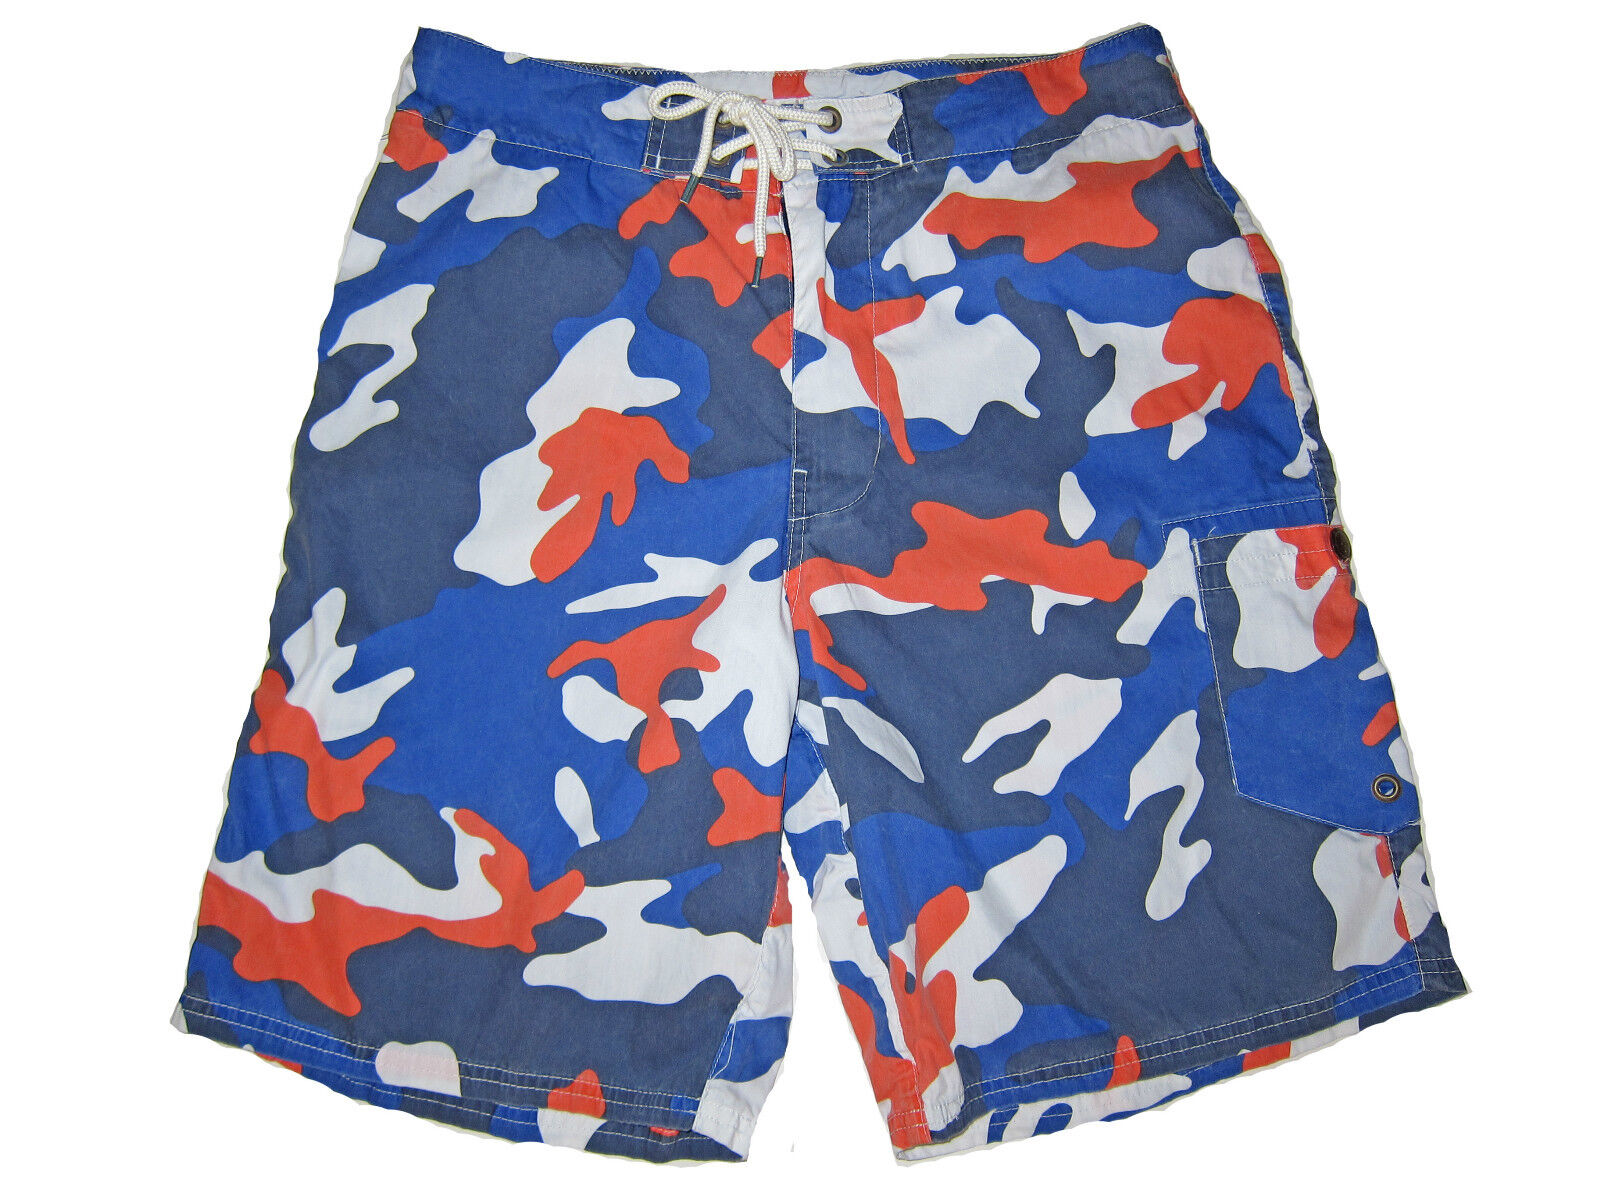 Polo Ralph Lauren bluee orange Camouflage Camo Swim Board Shorts Suit 38